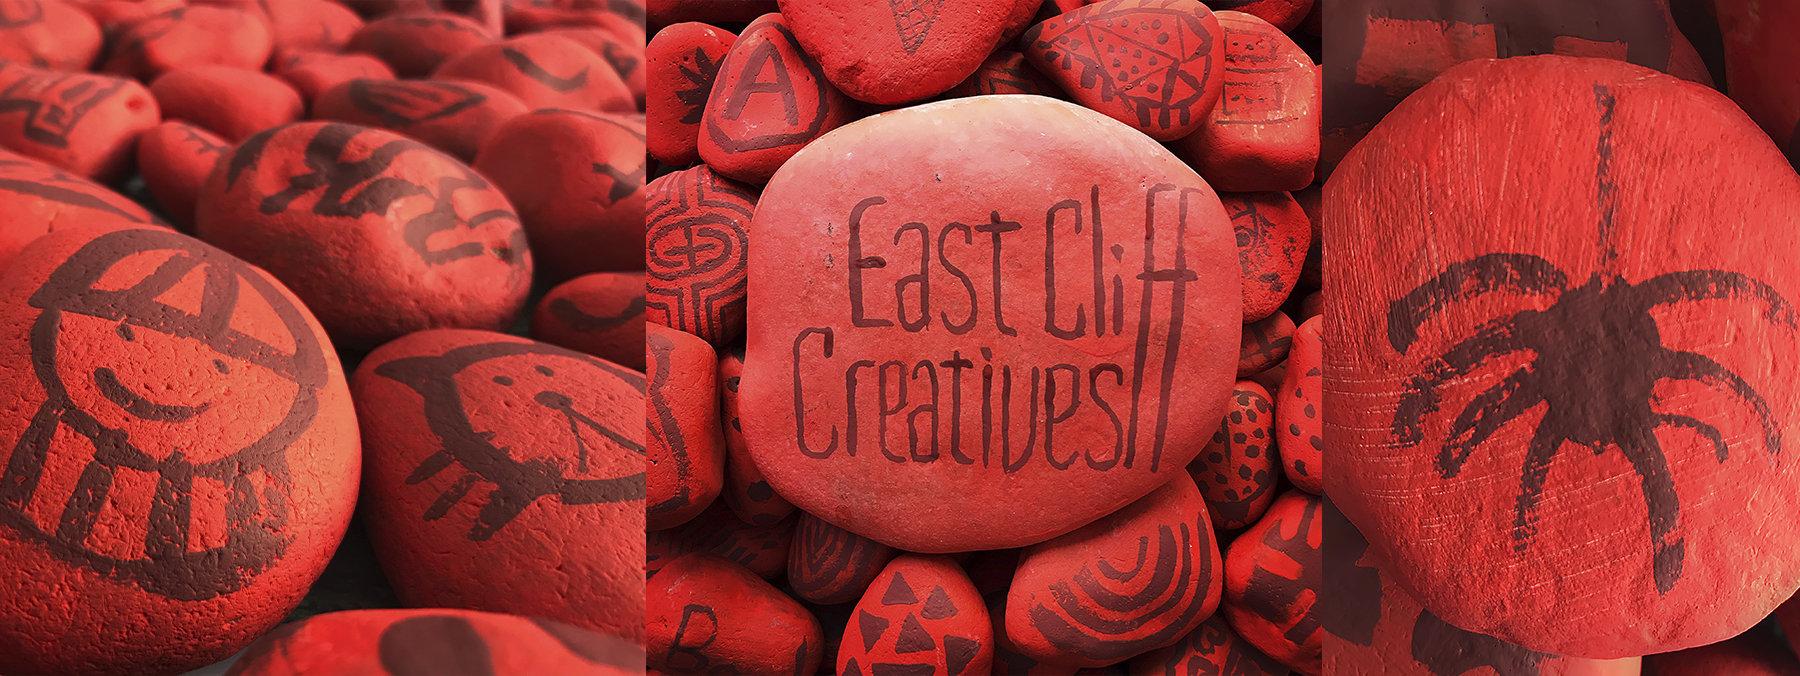 East Cliff Creatives Pebbles